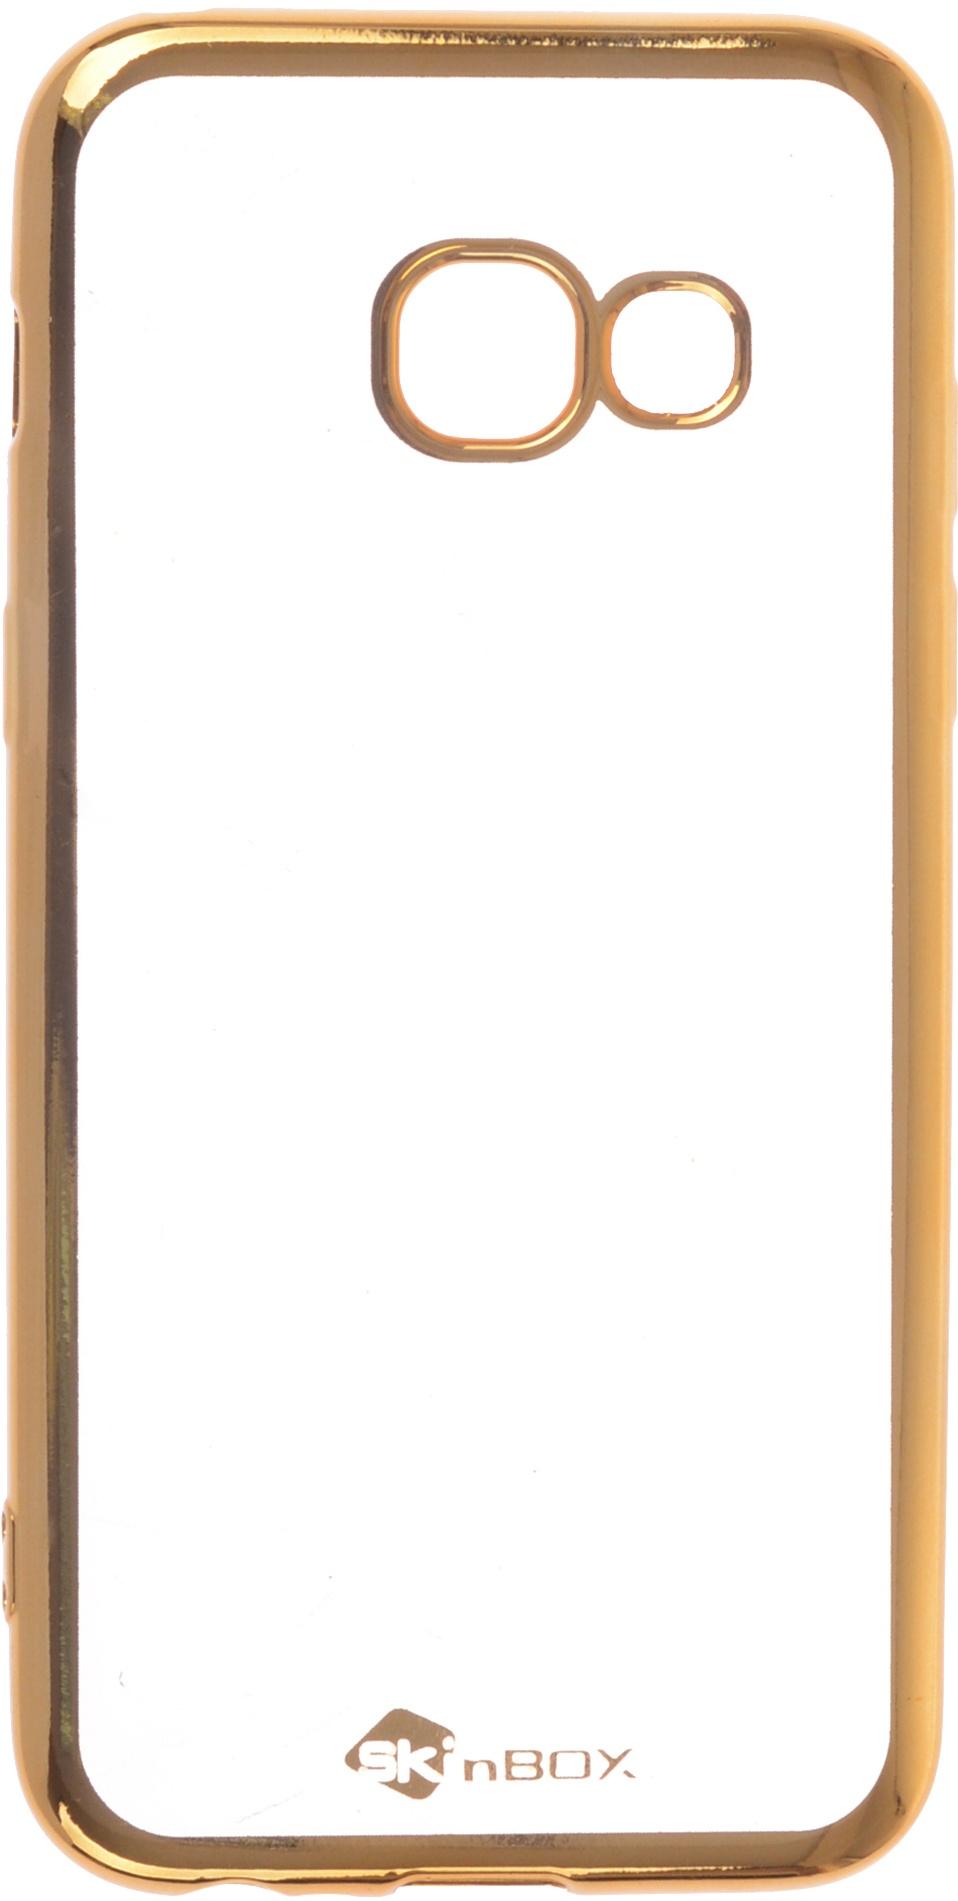 Чехол для сотового телефона skinBOX Silicone chrome border, 4630042529403, золотой skinbox 4people slim silicone чехол накладка для xiaomi redmi 4a transparent